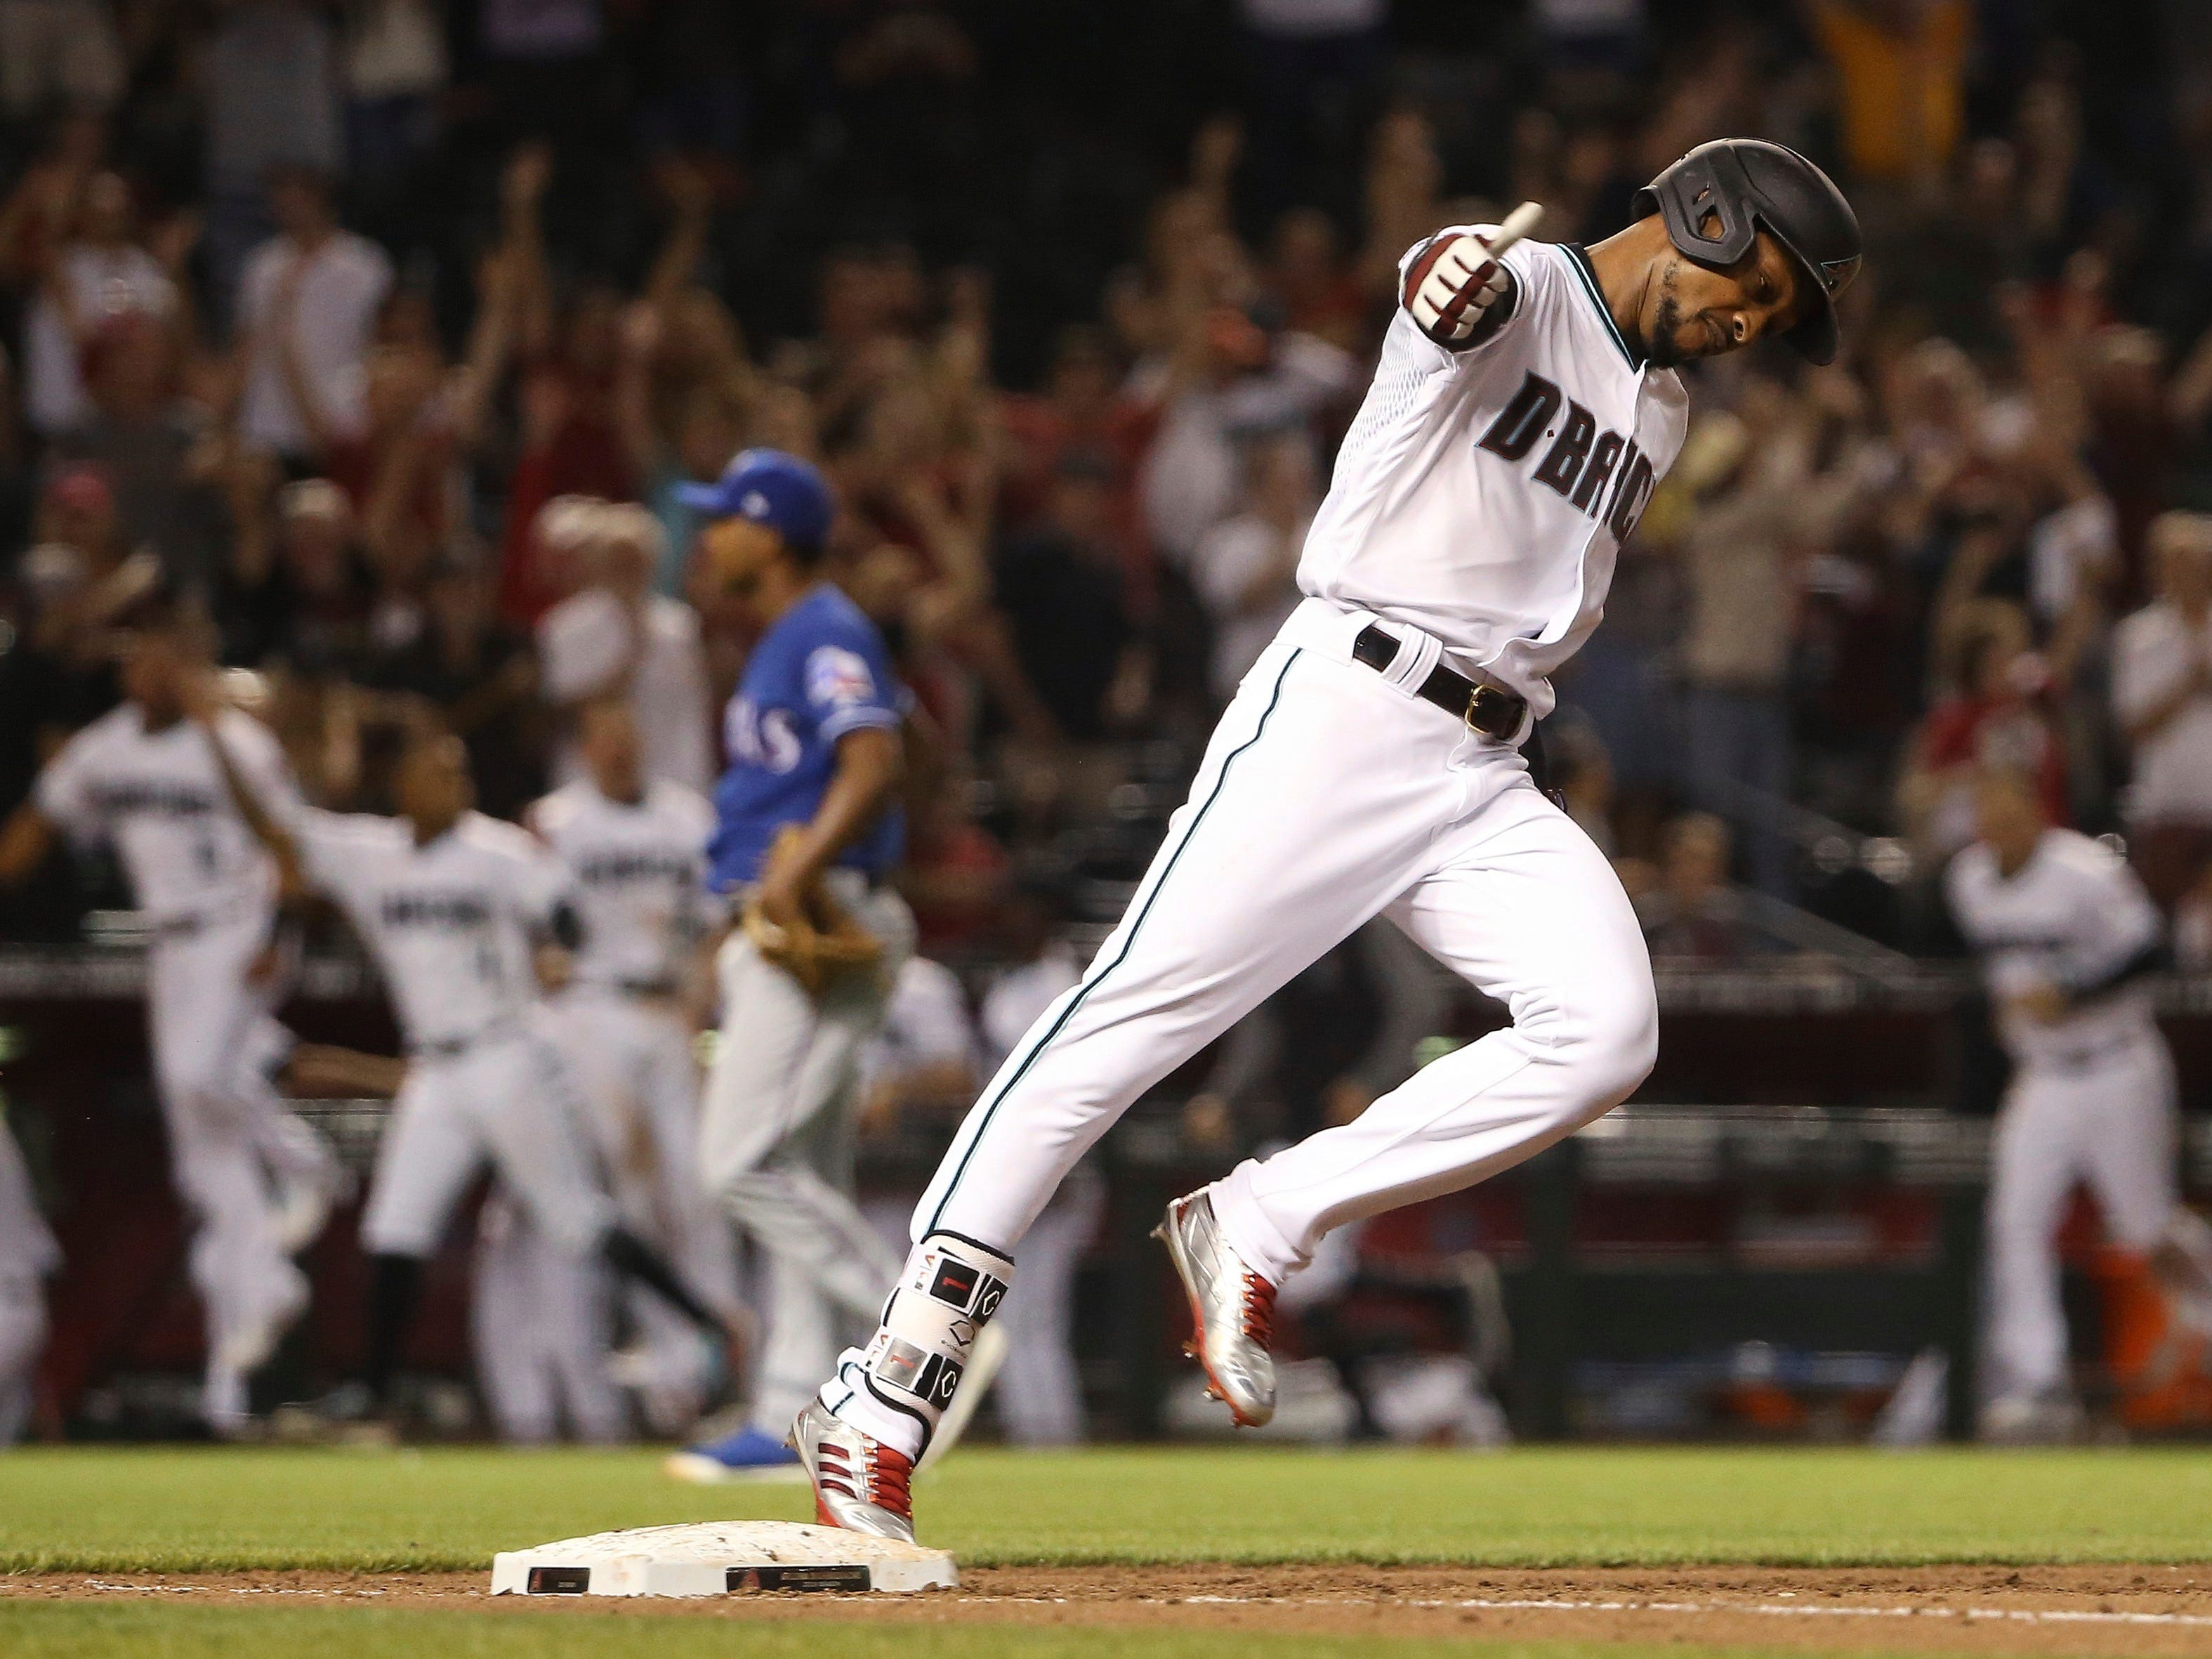 Arizona Diamondbacks' Jarrod Dyson celebrates his two-run walk-off home run against the Texas Rangers in a baseball game Tuesday, April 9, 2019, in Phoenix. The Diamondbacks defeated the Rangers 5-4. (AP Photo/Ross D. Franklin)